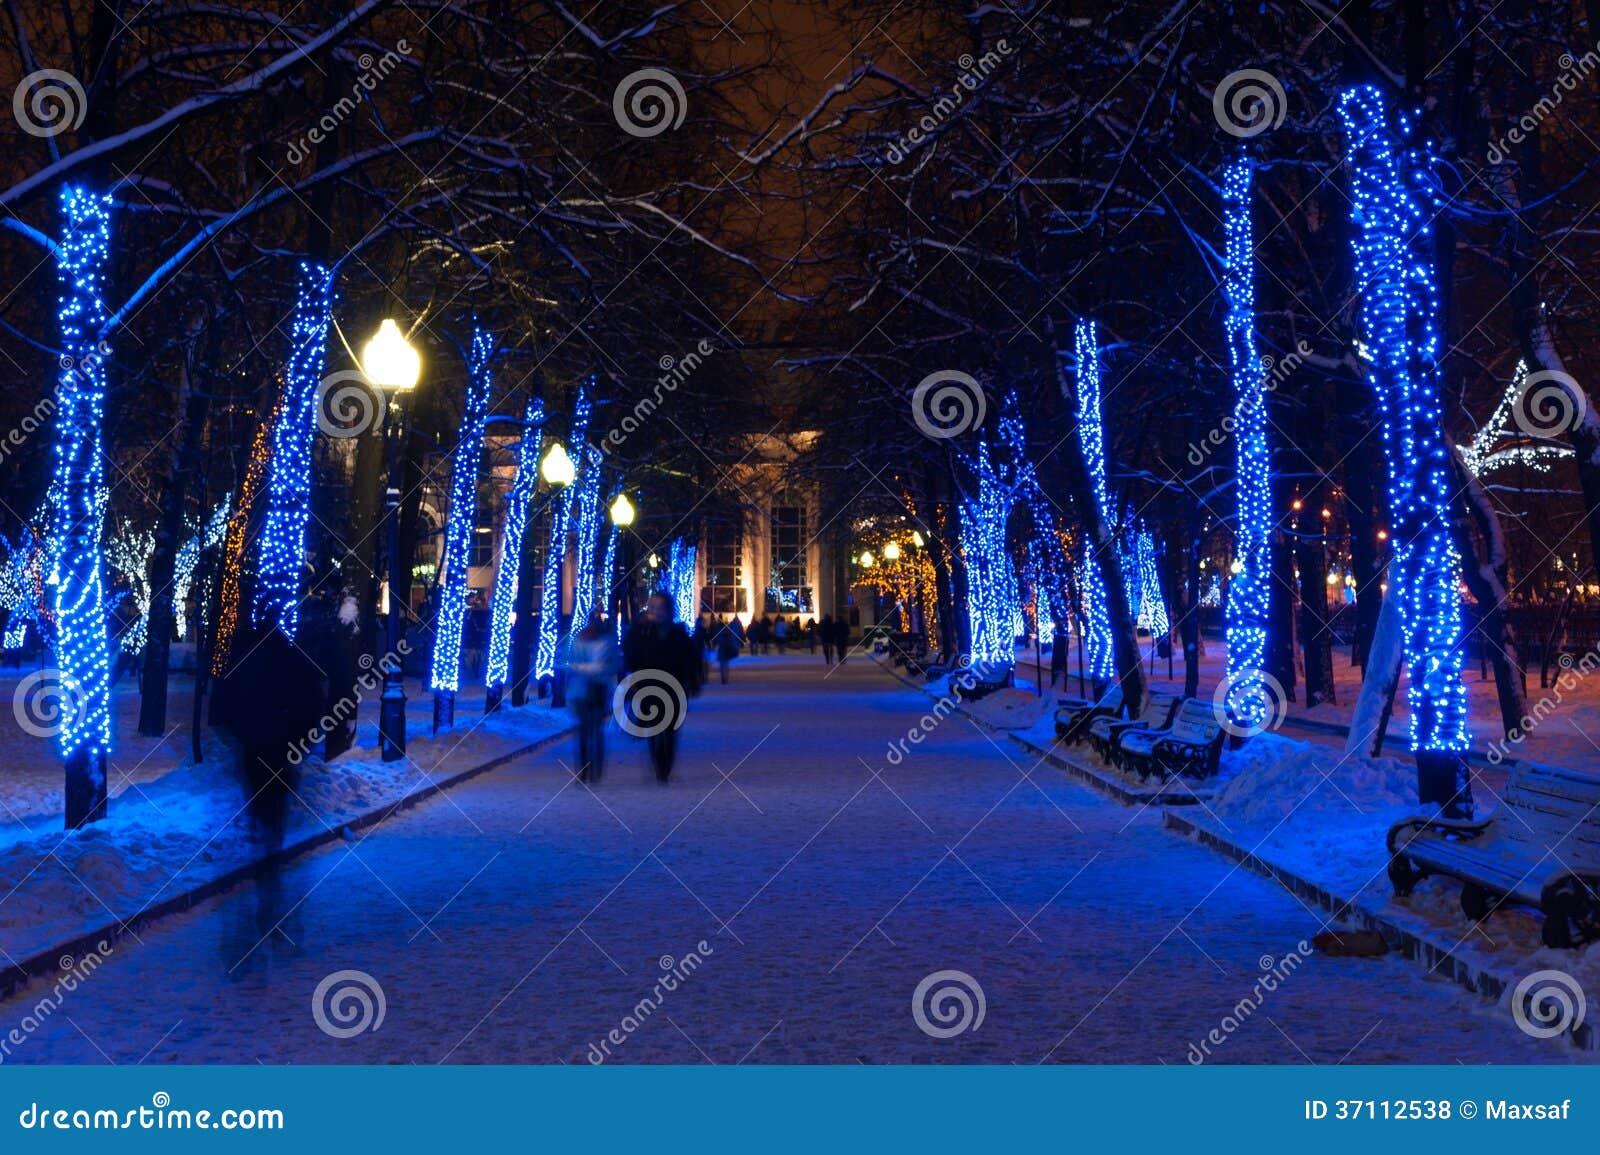 Christmas Led Lights Outdoor